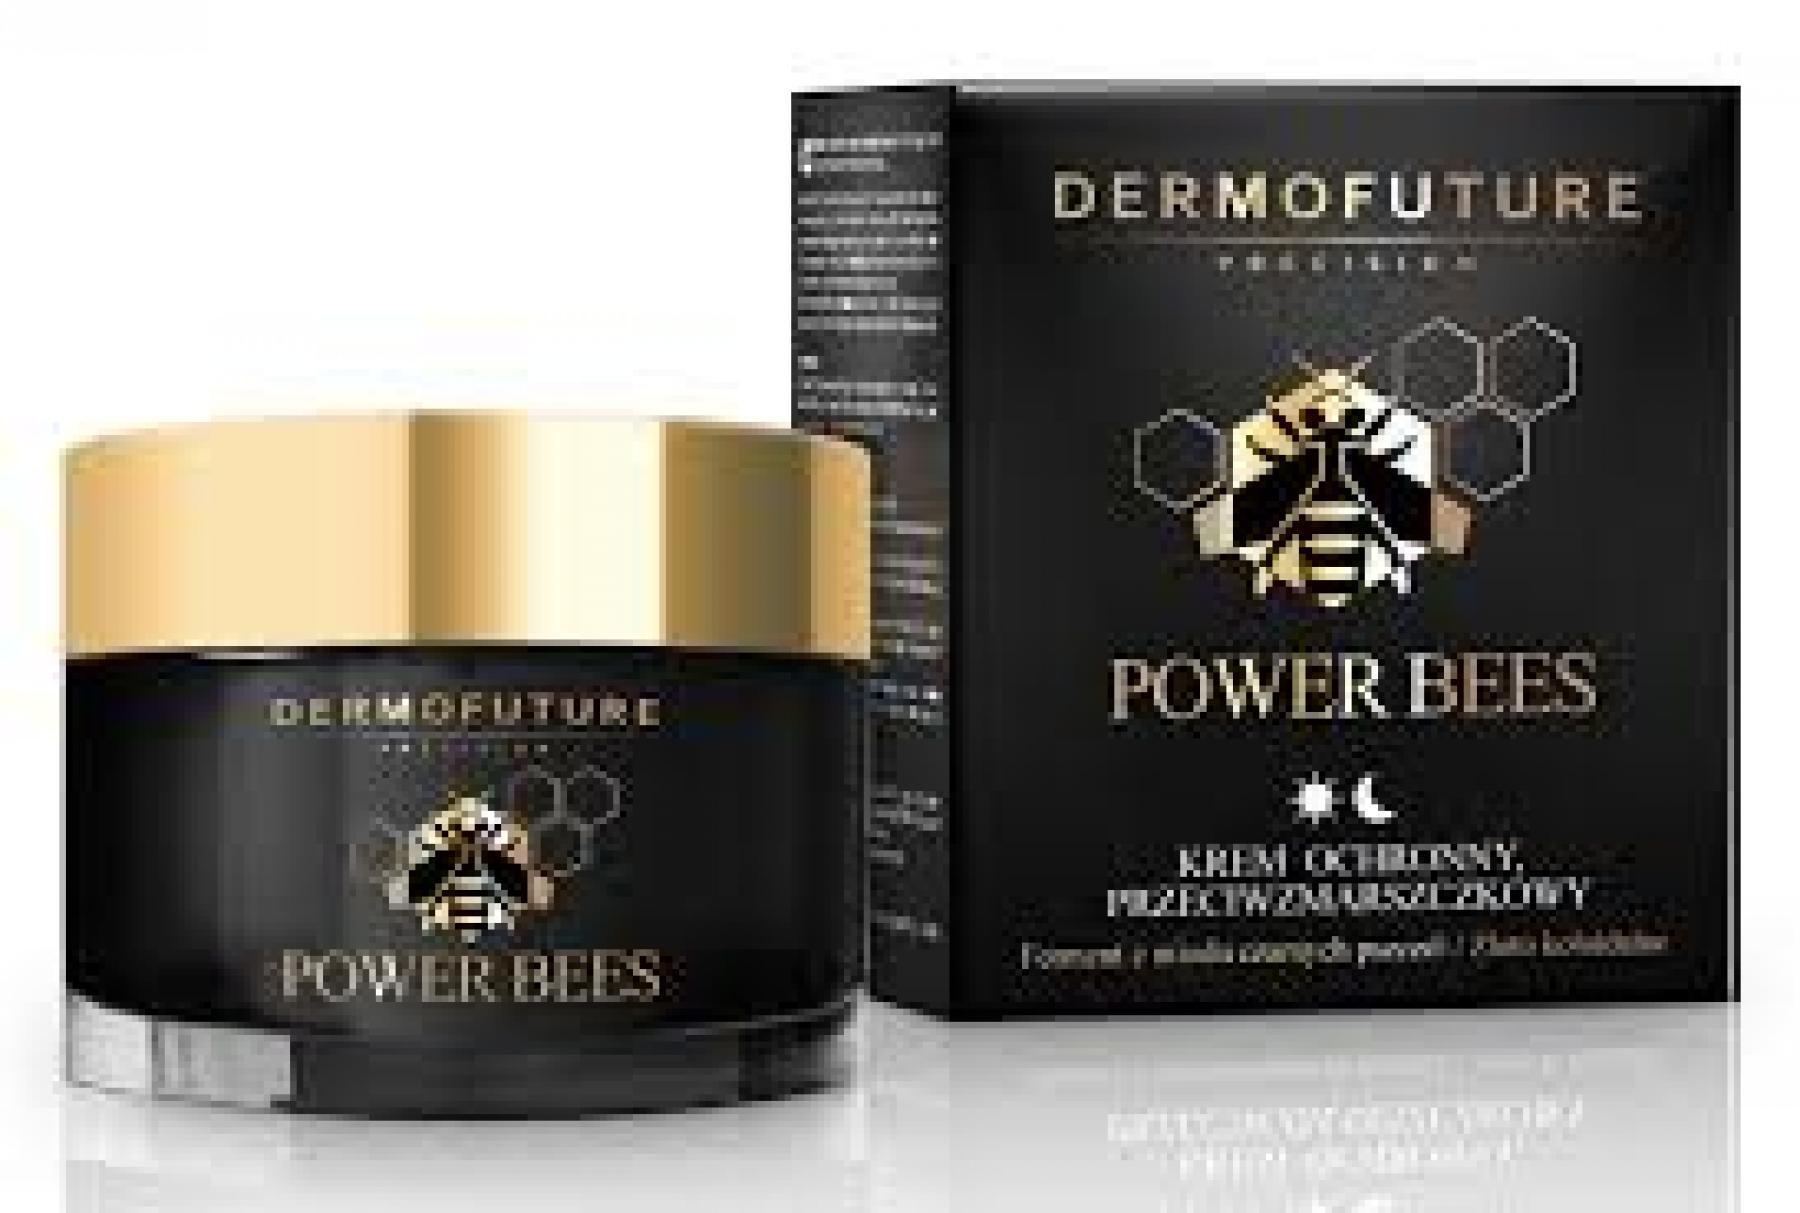 Power bees face cream 50ml